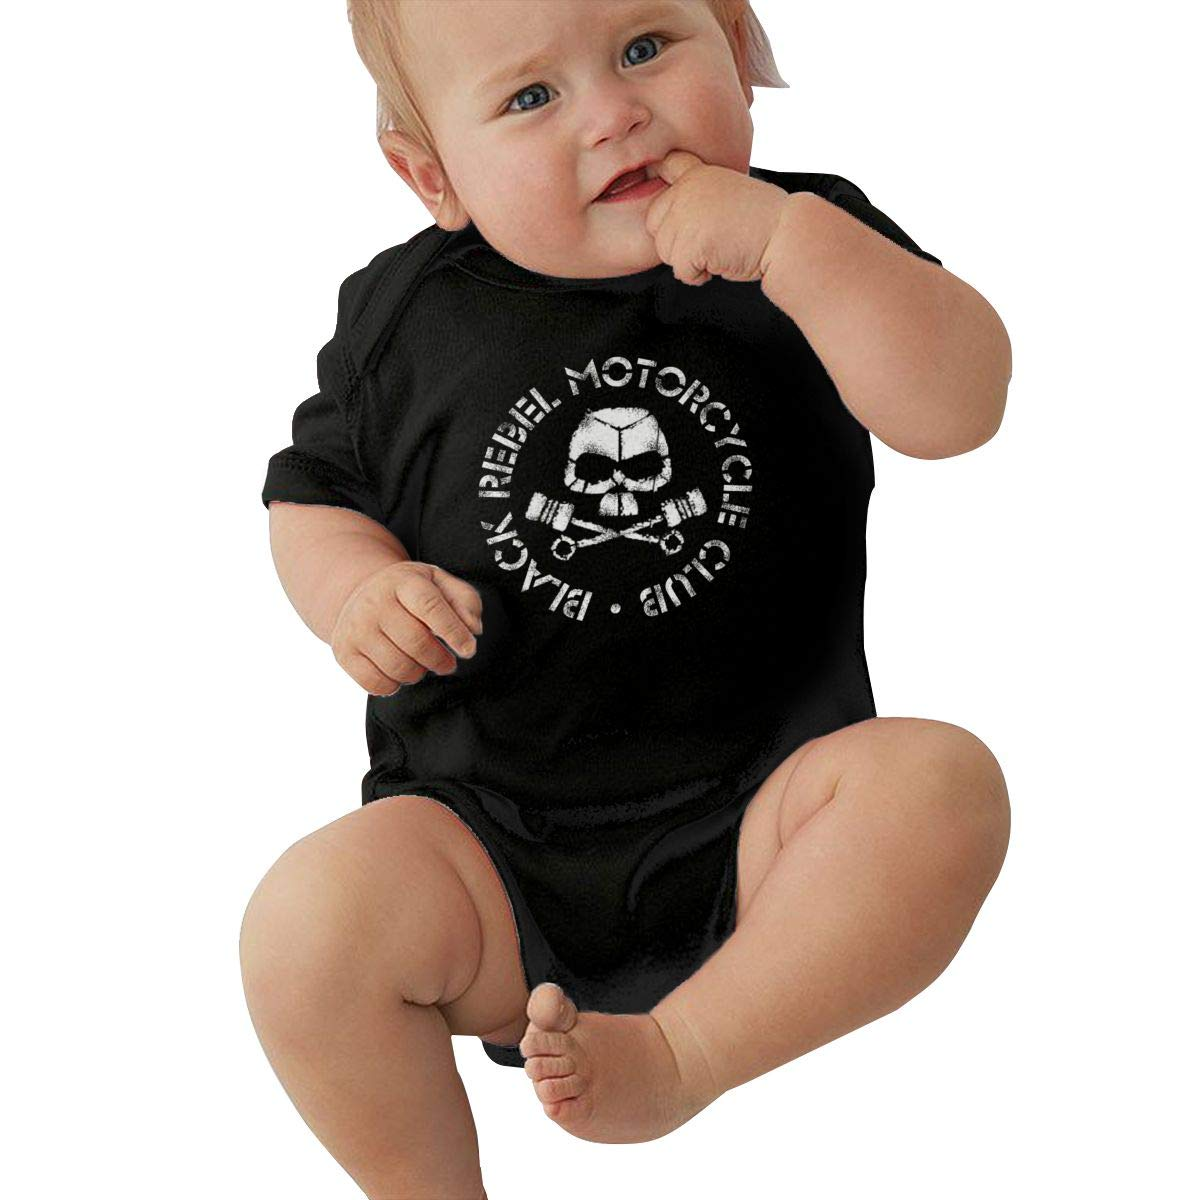 SusanHuling Black Rebel Motorcycle Club Band Unisex Baby Boys Girls Romper Bodysuit Infant Funny Jumpsuit